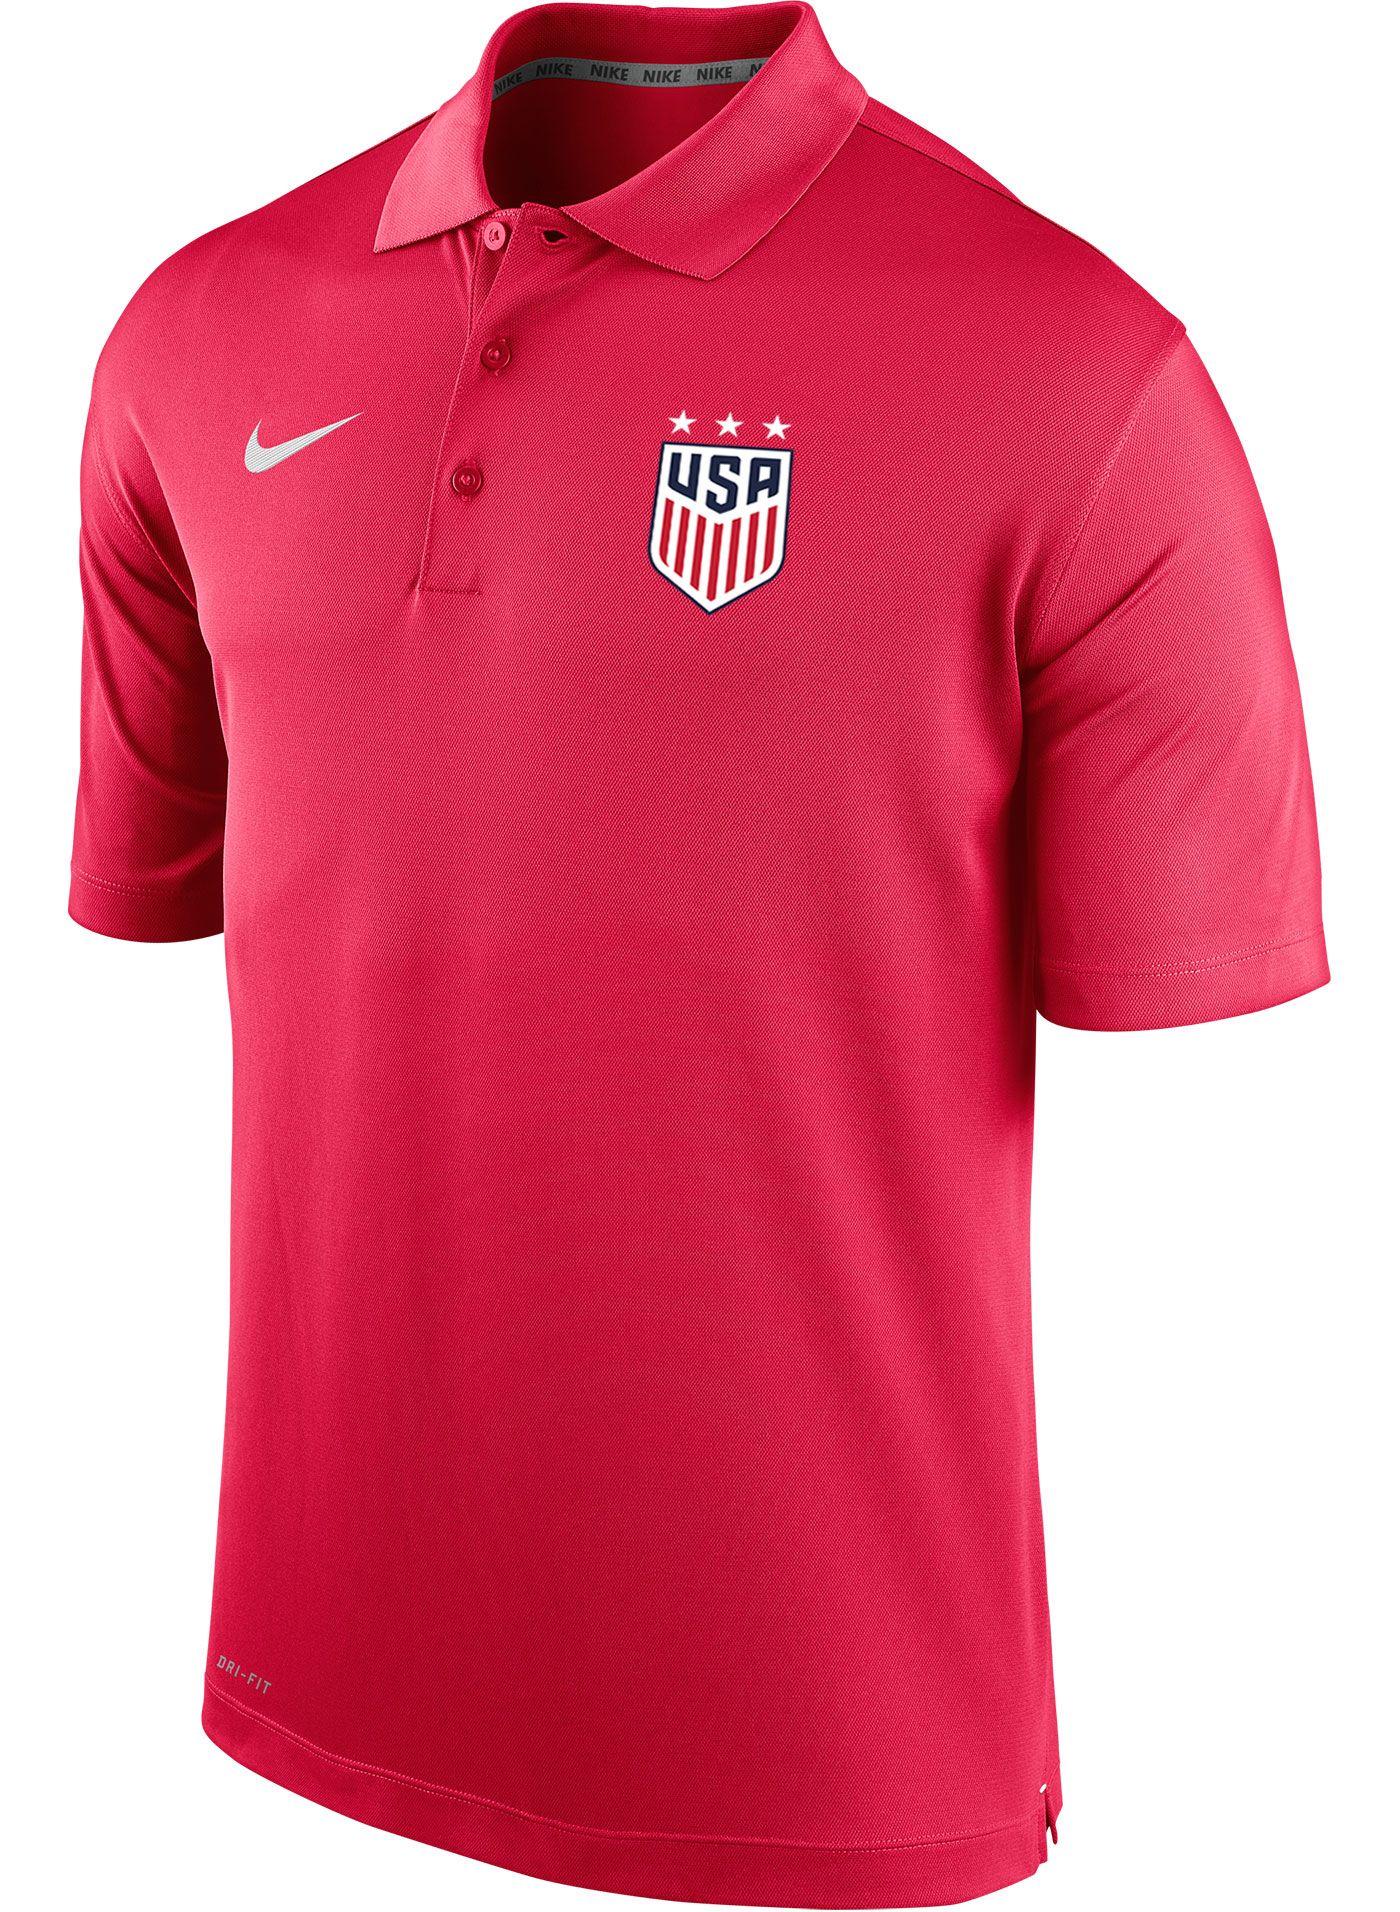 Nike Men's 2019 FIFA Women's World Cup USA Soccer Varsity Red Polo